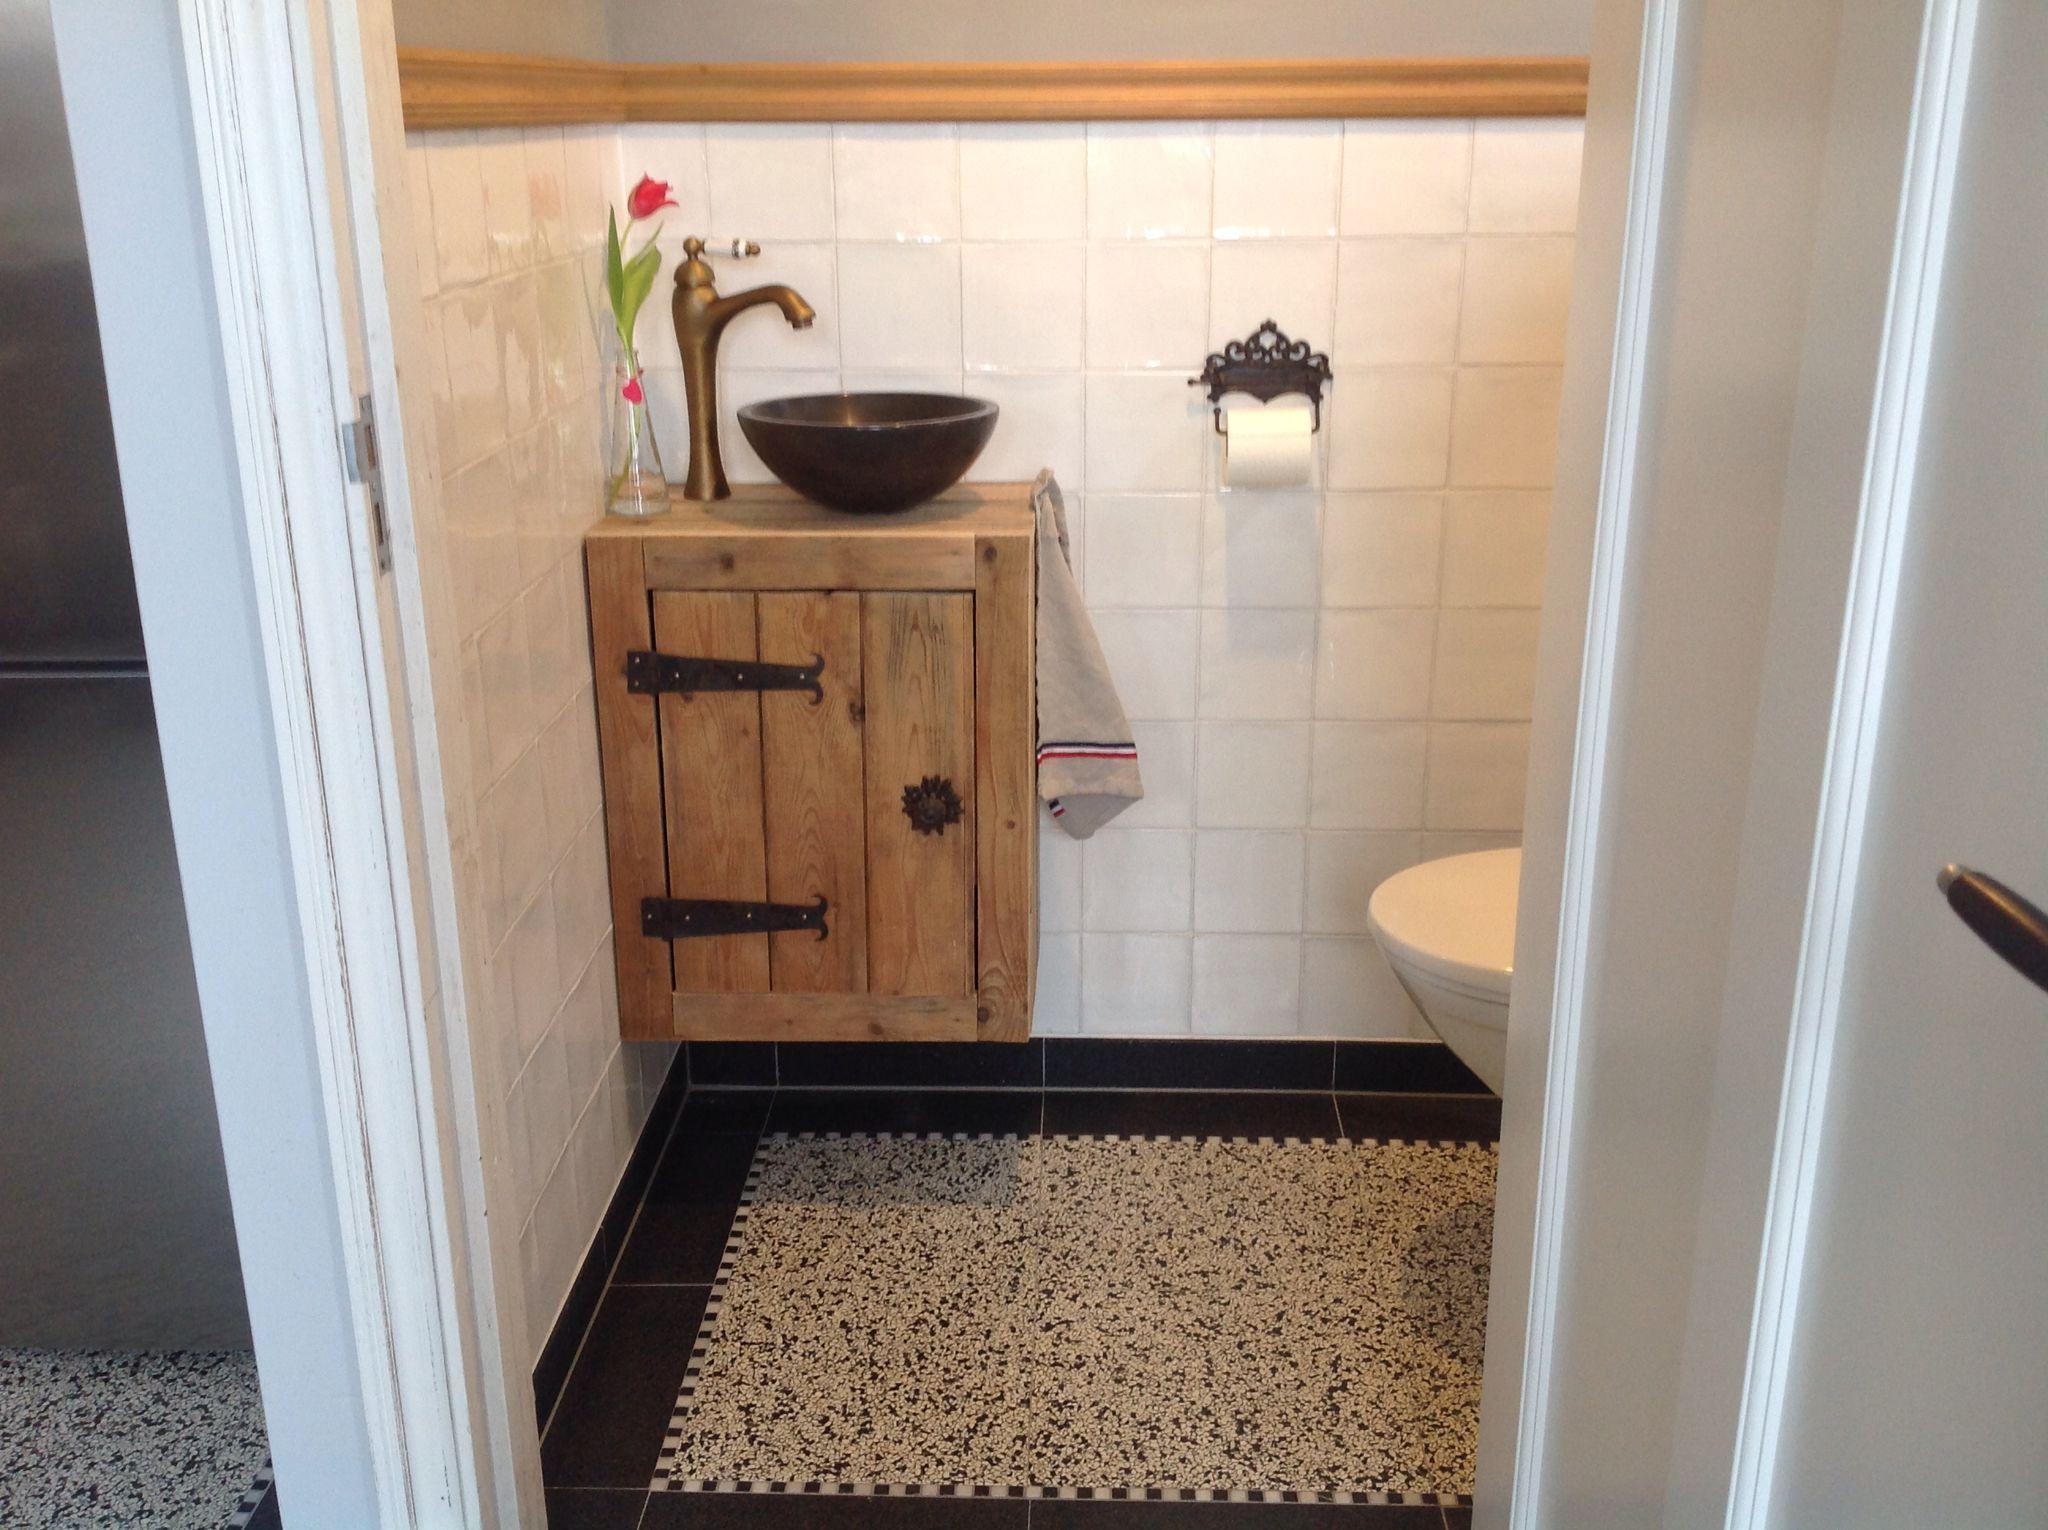 Fonteintje toilet van oud hout fonteintje pinterest toilet interiors and house - Rustieke wc ...